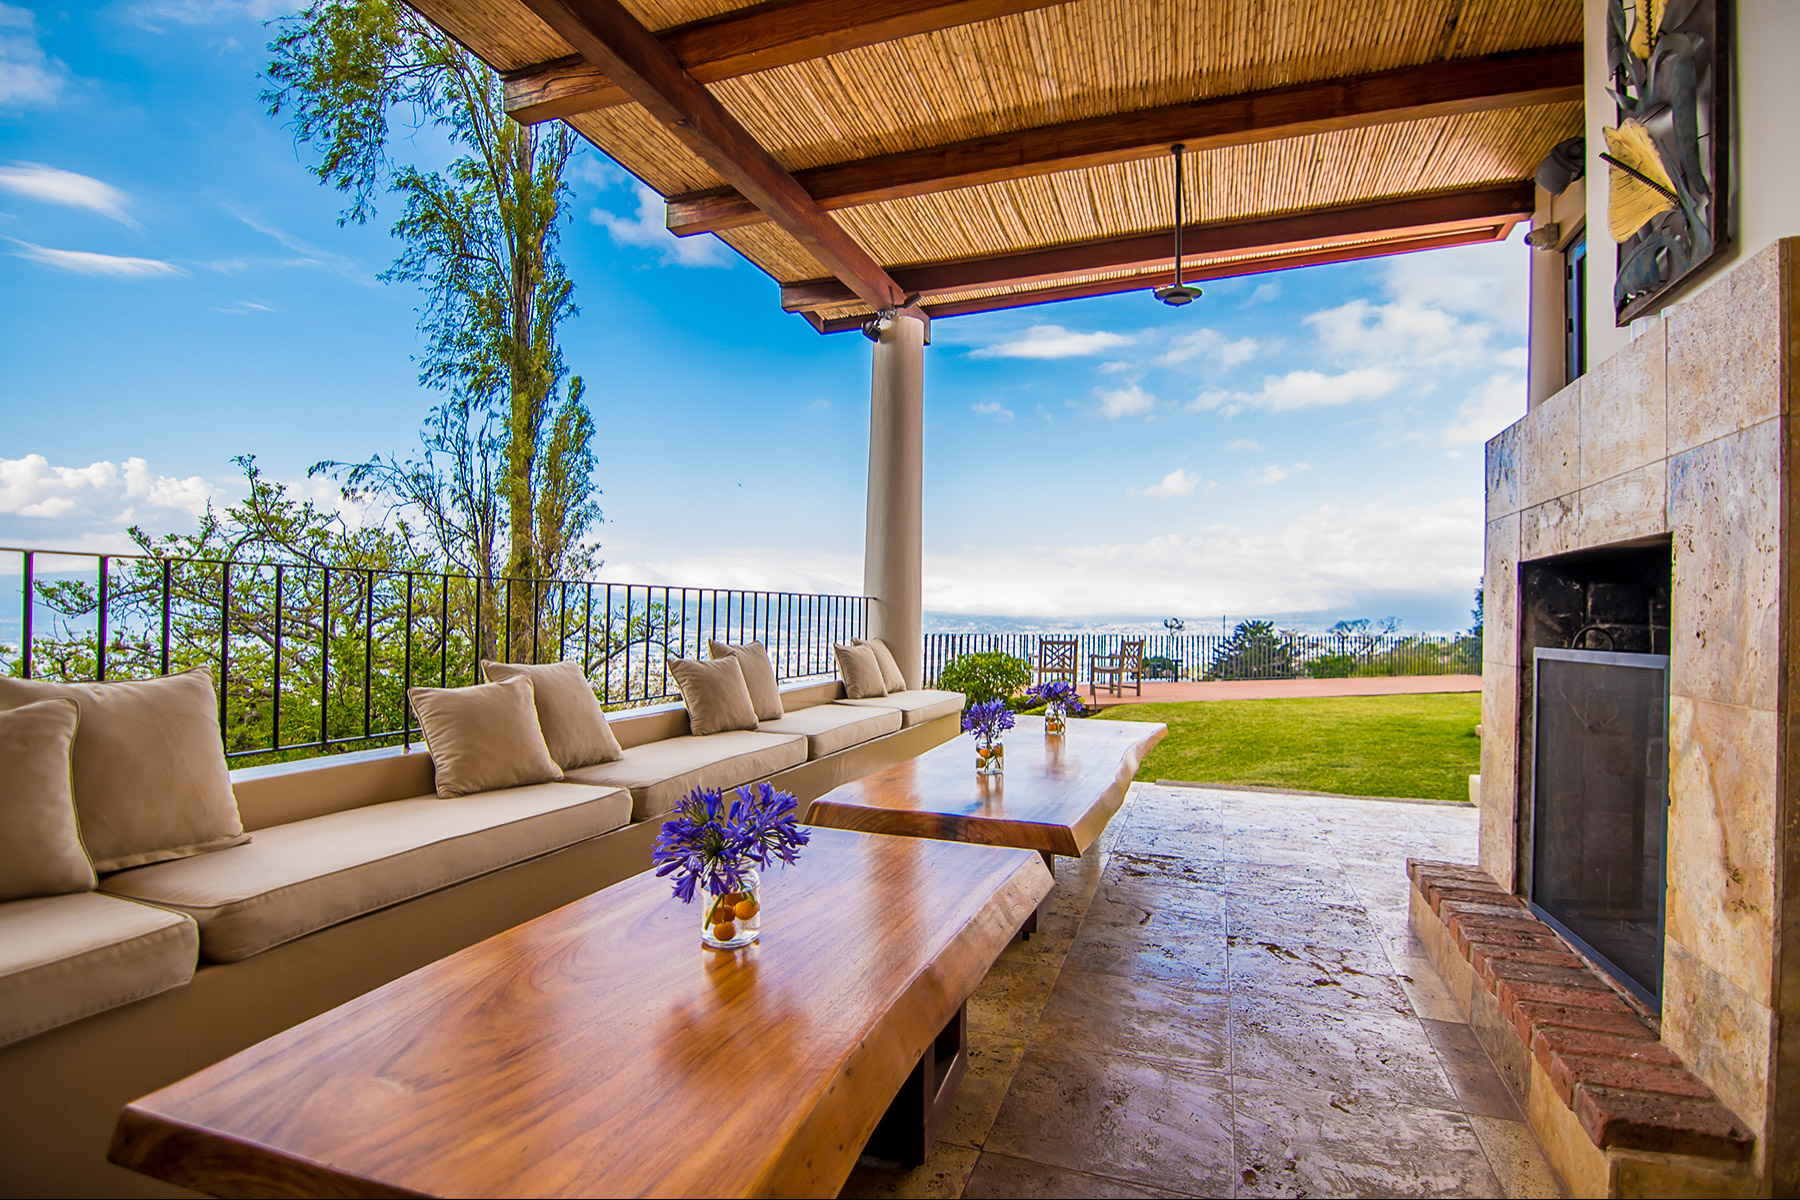 Other Residential Homes for Sale at Casa San Antonio Escazu, San Jose Costa Rica